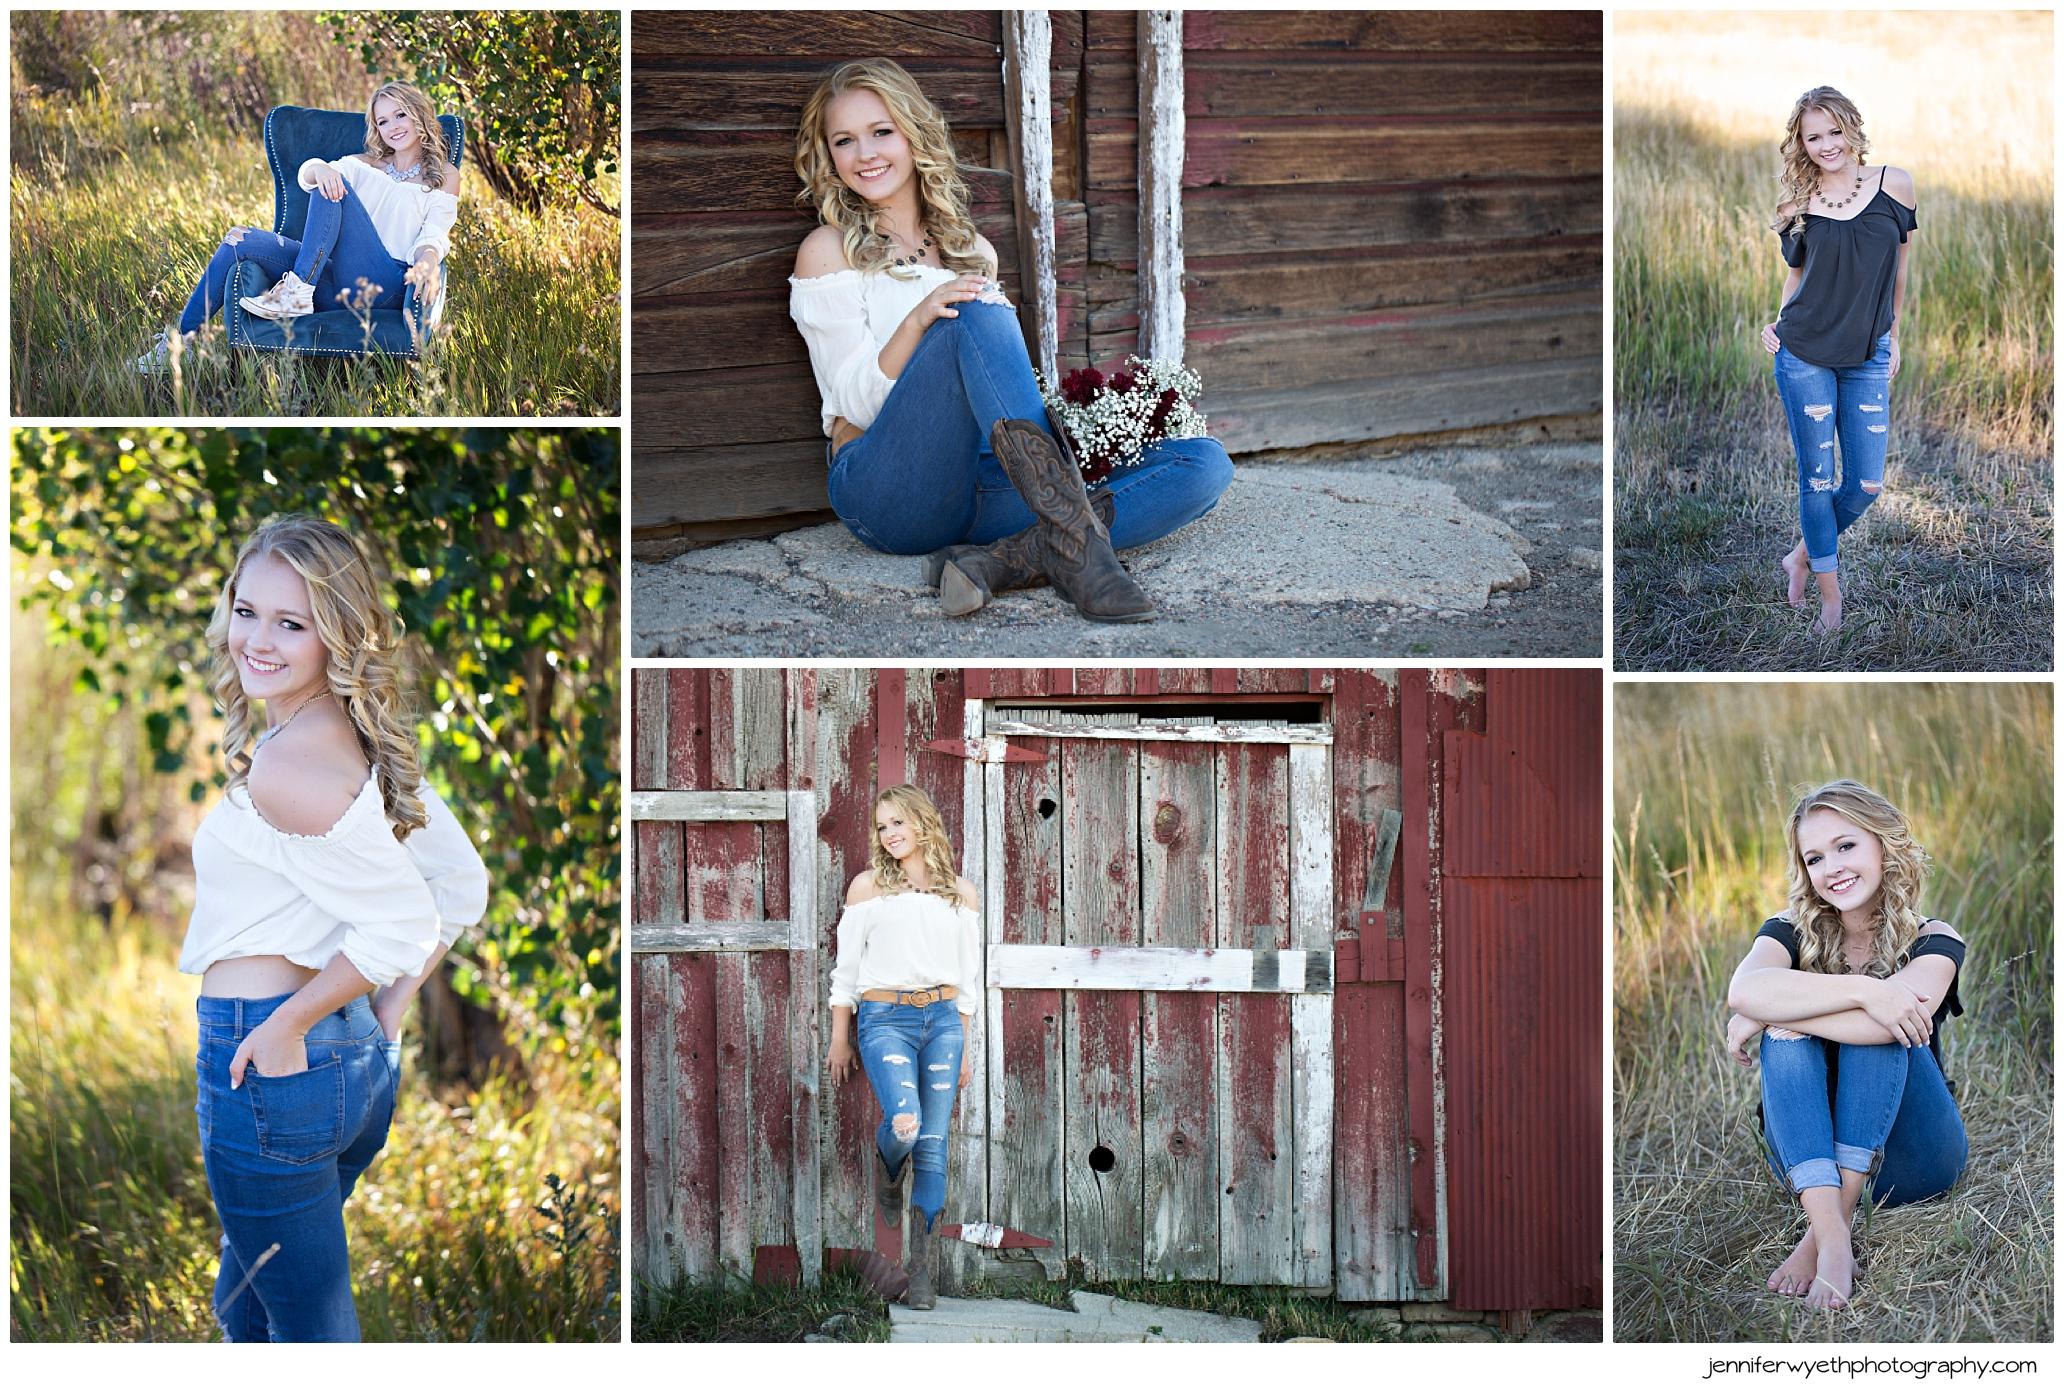 Jennifer-Wyeth-photography-senior-pictures-colorado-springs-photographer_0187.jpg